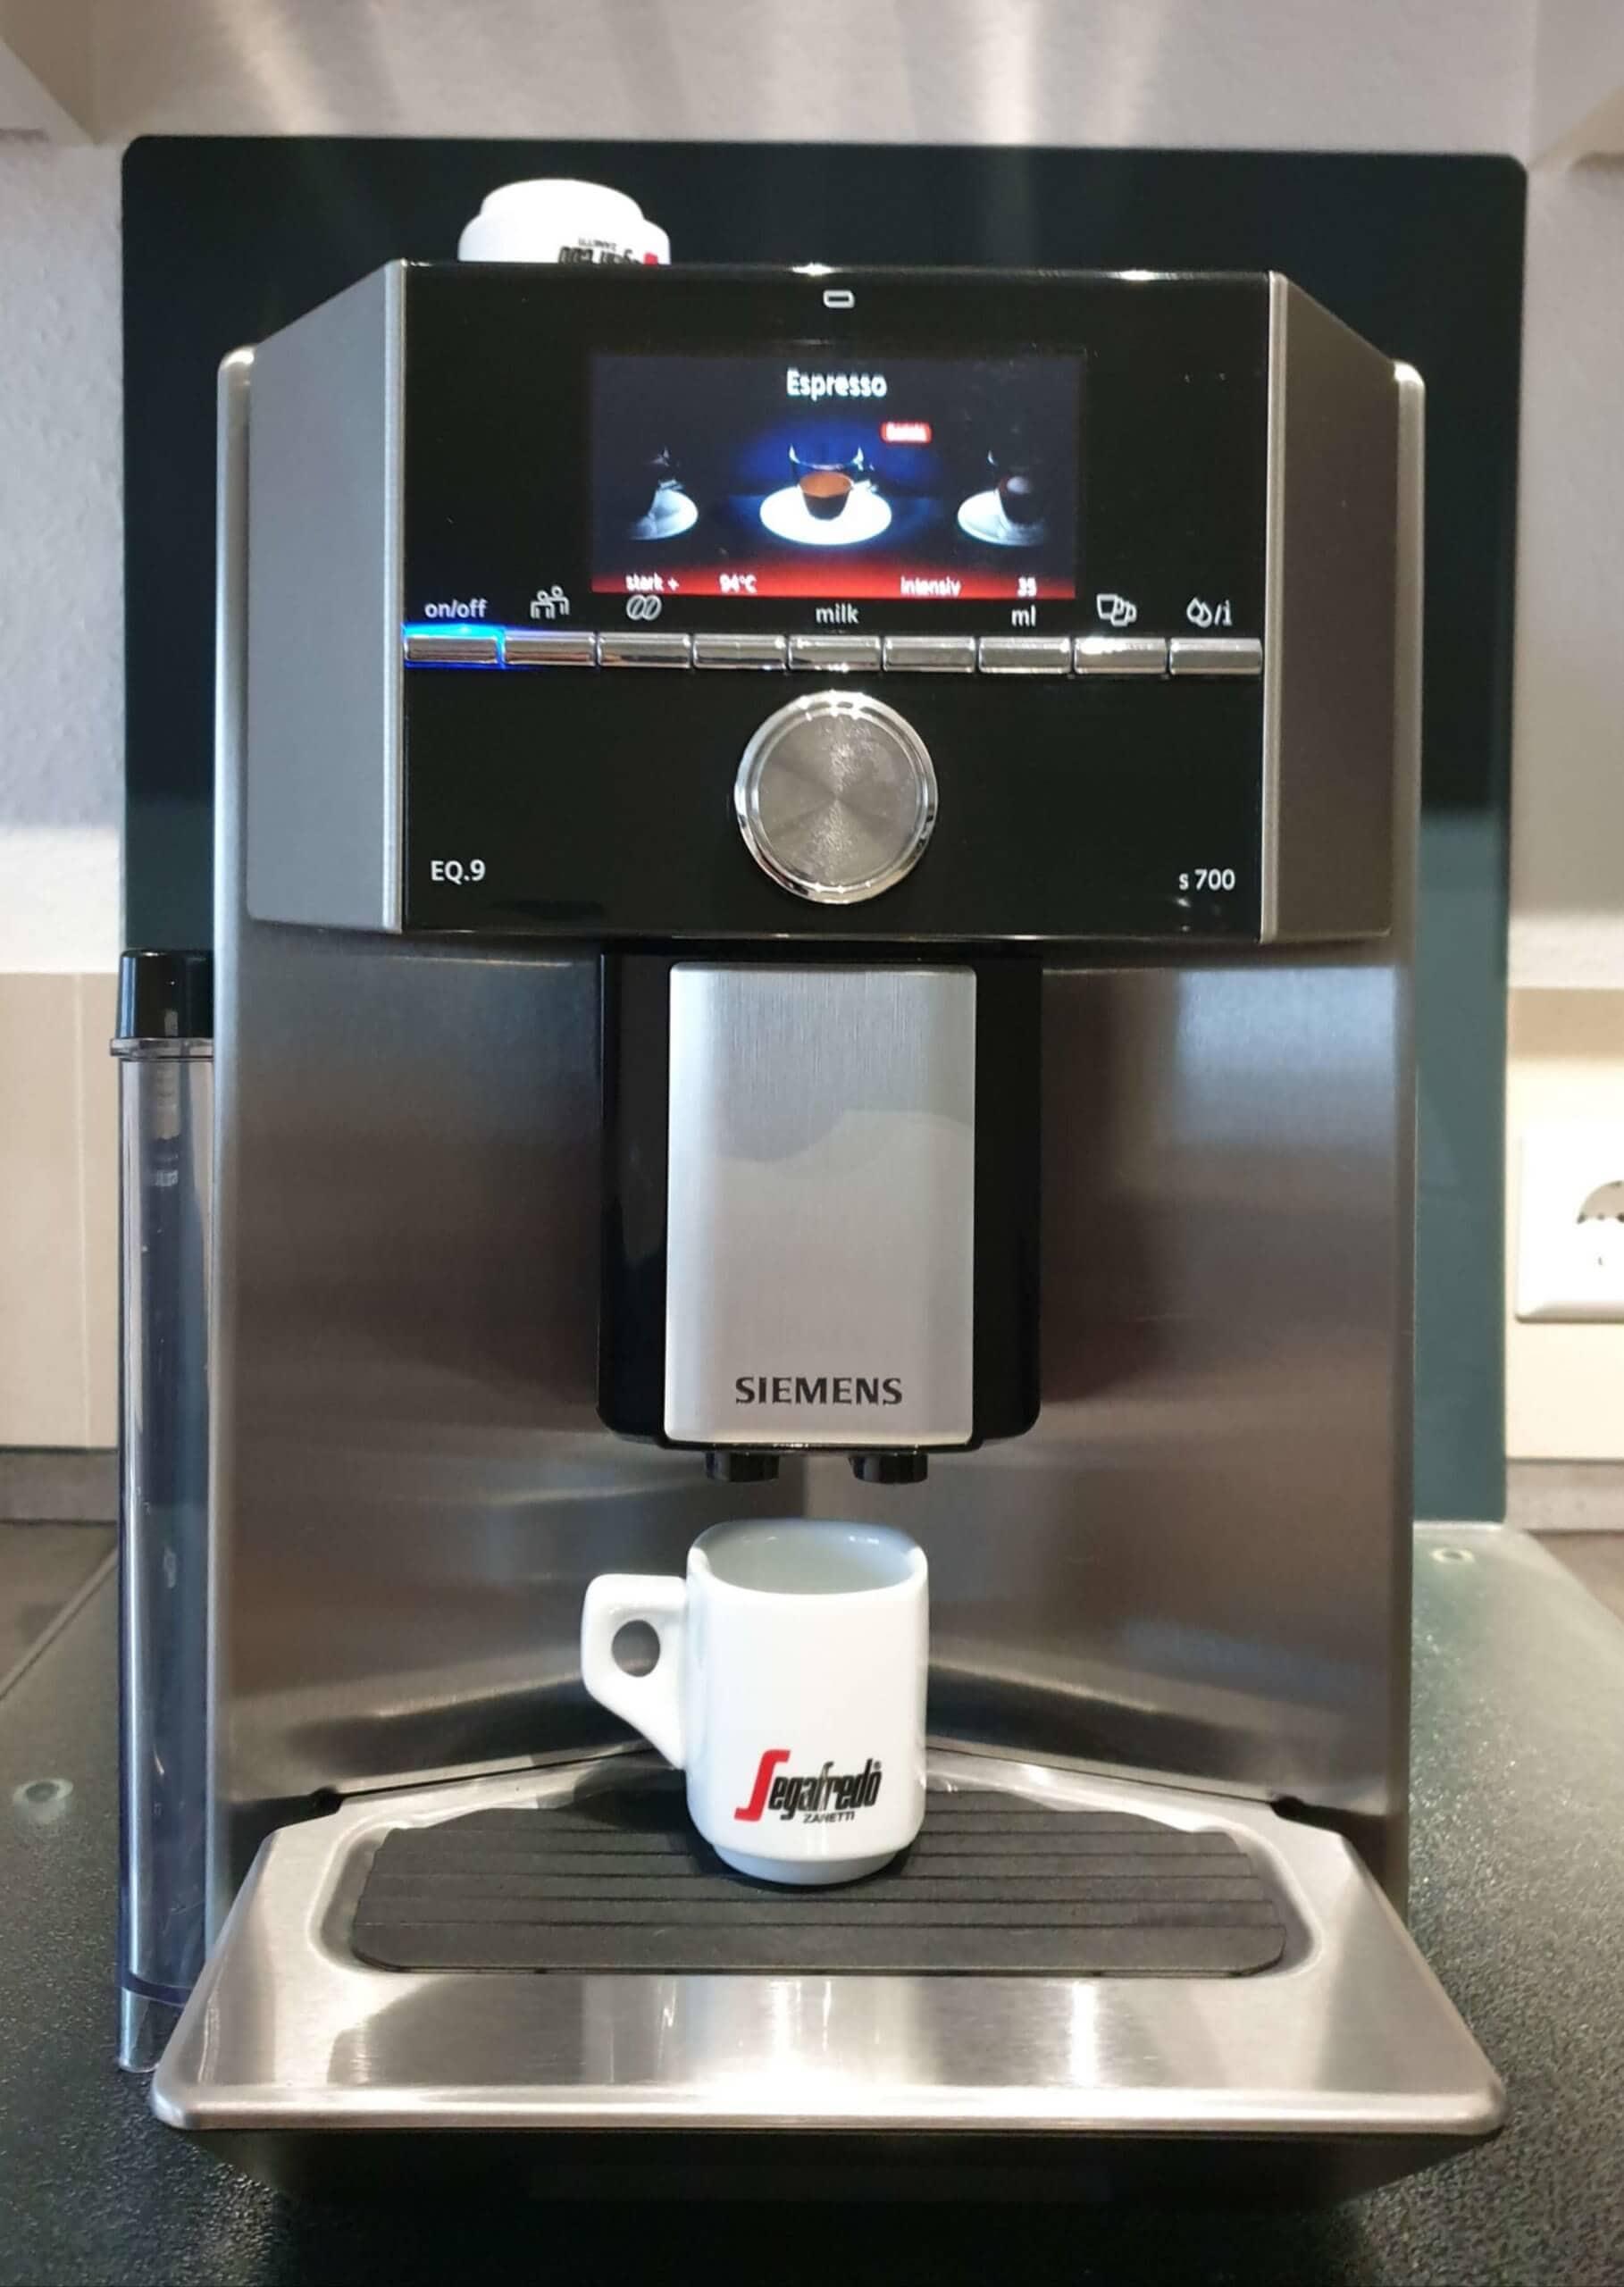 Siemens EQ9 test Kaffeeauslauf Espresso